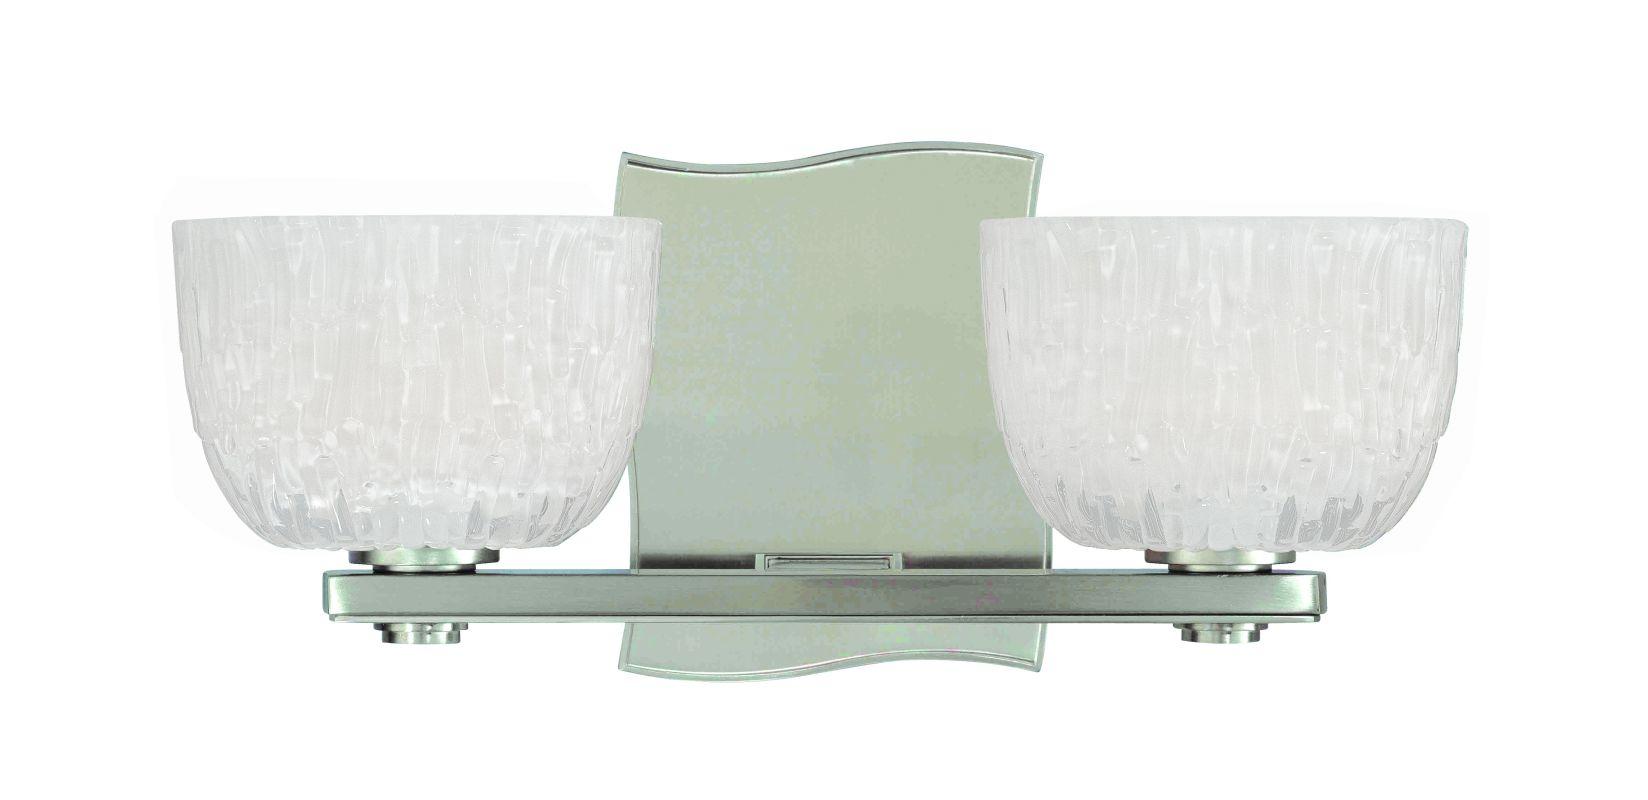 Hudson Valley Lighting 2662 Two Light Up Lighting Bath Vanity with Sale $268.00 ITEM: bci1737236 ID#:2662-SN UPC: 806134123482 :